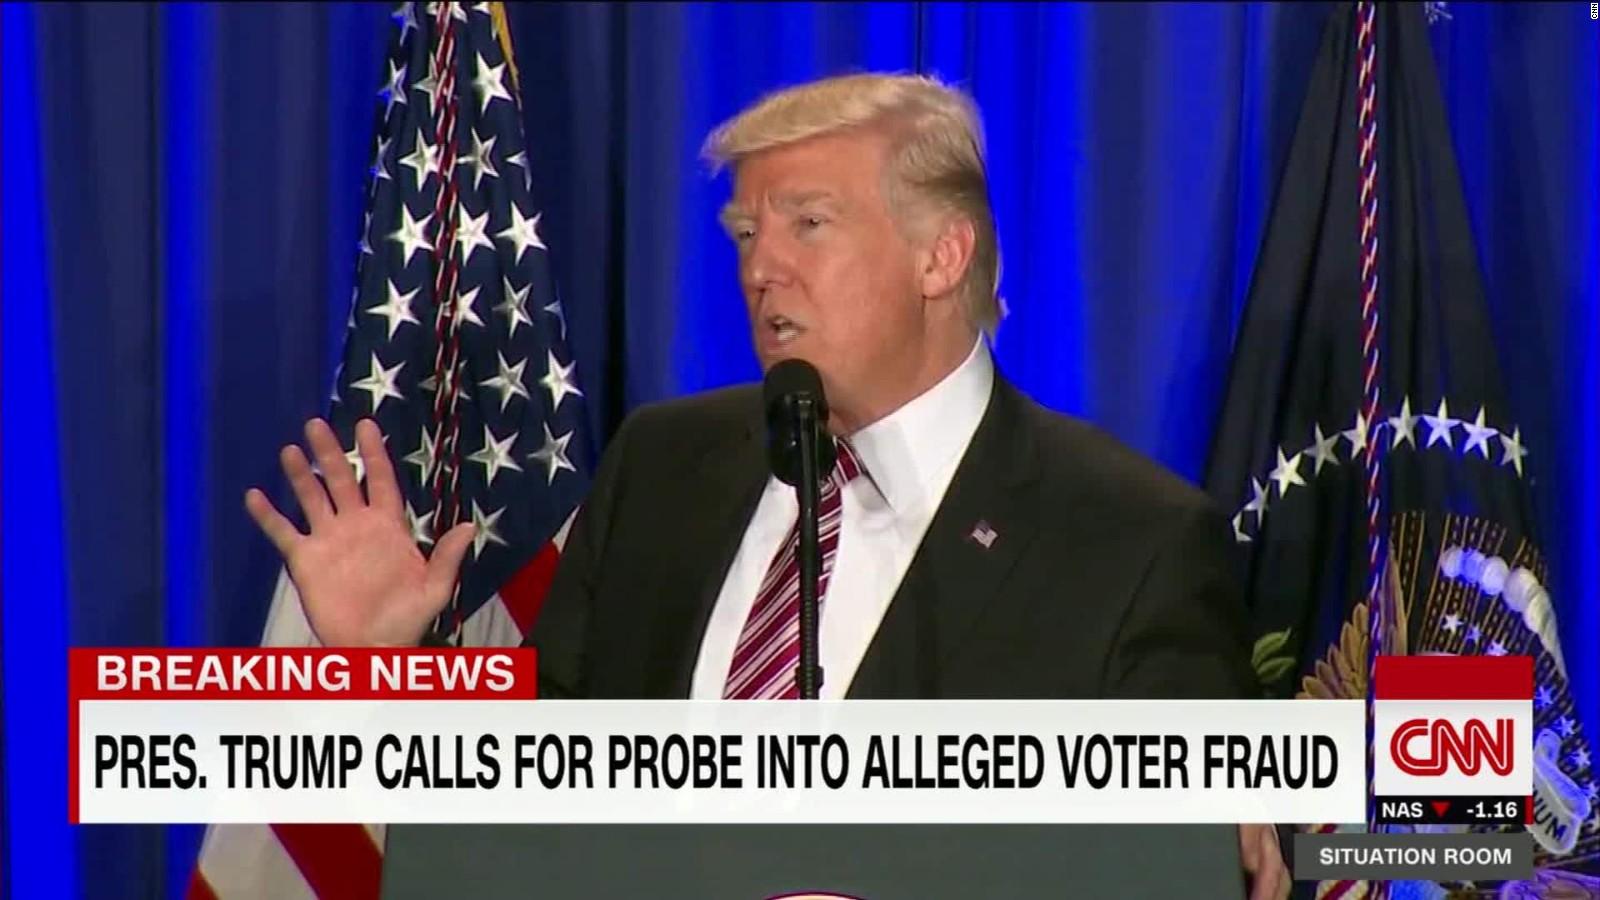 http://cdn.cnn.com/cnnnext/dam/assets/170126173402-trump-voter-fraud-investigation-brown-dnt-tsr-00002005-full-169.jpg